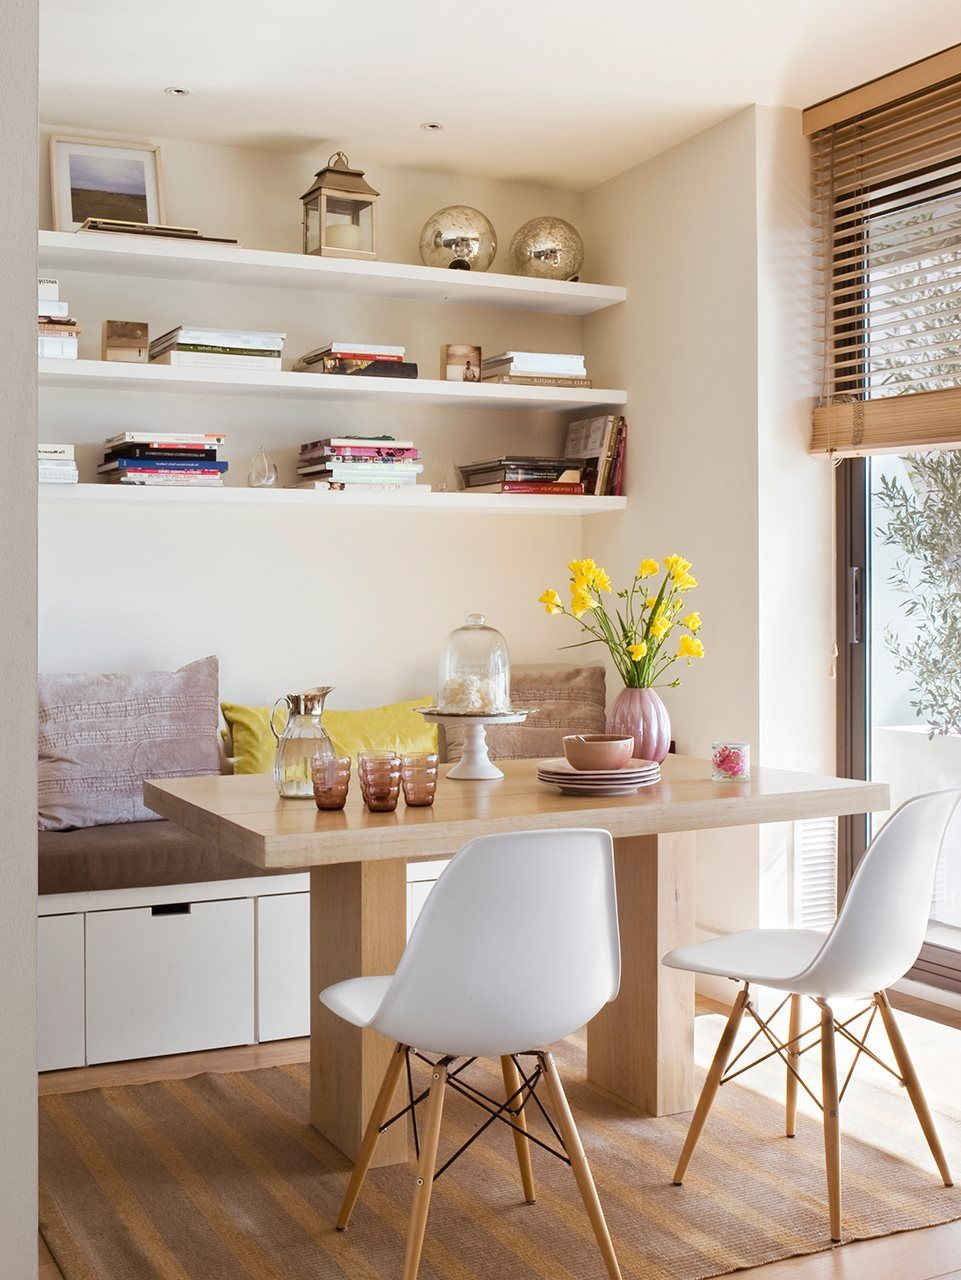 Mesa de cocina con banco rinconera awesome top great for Banco rinconera cocina blanco